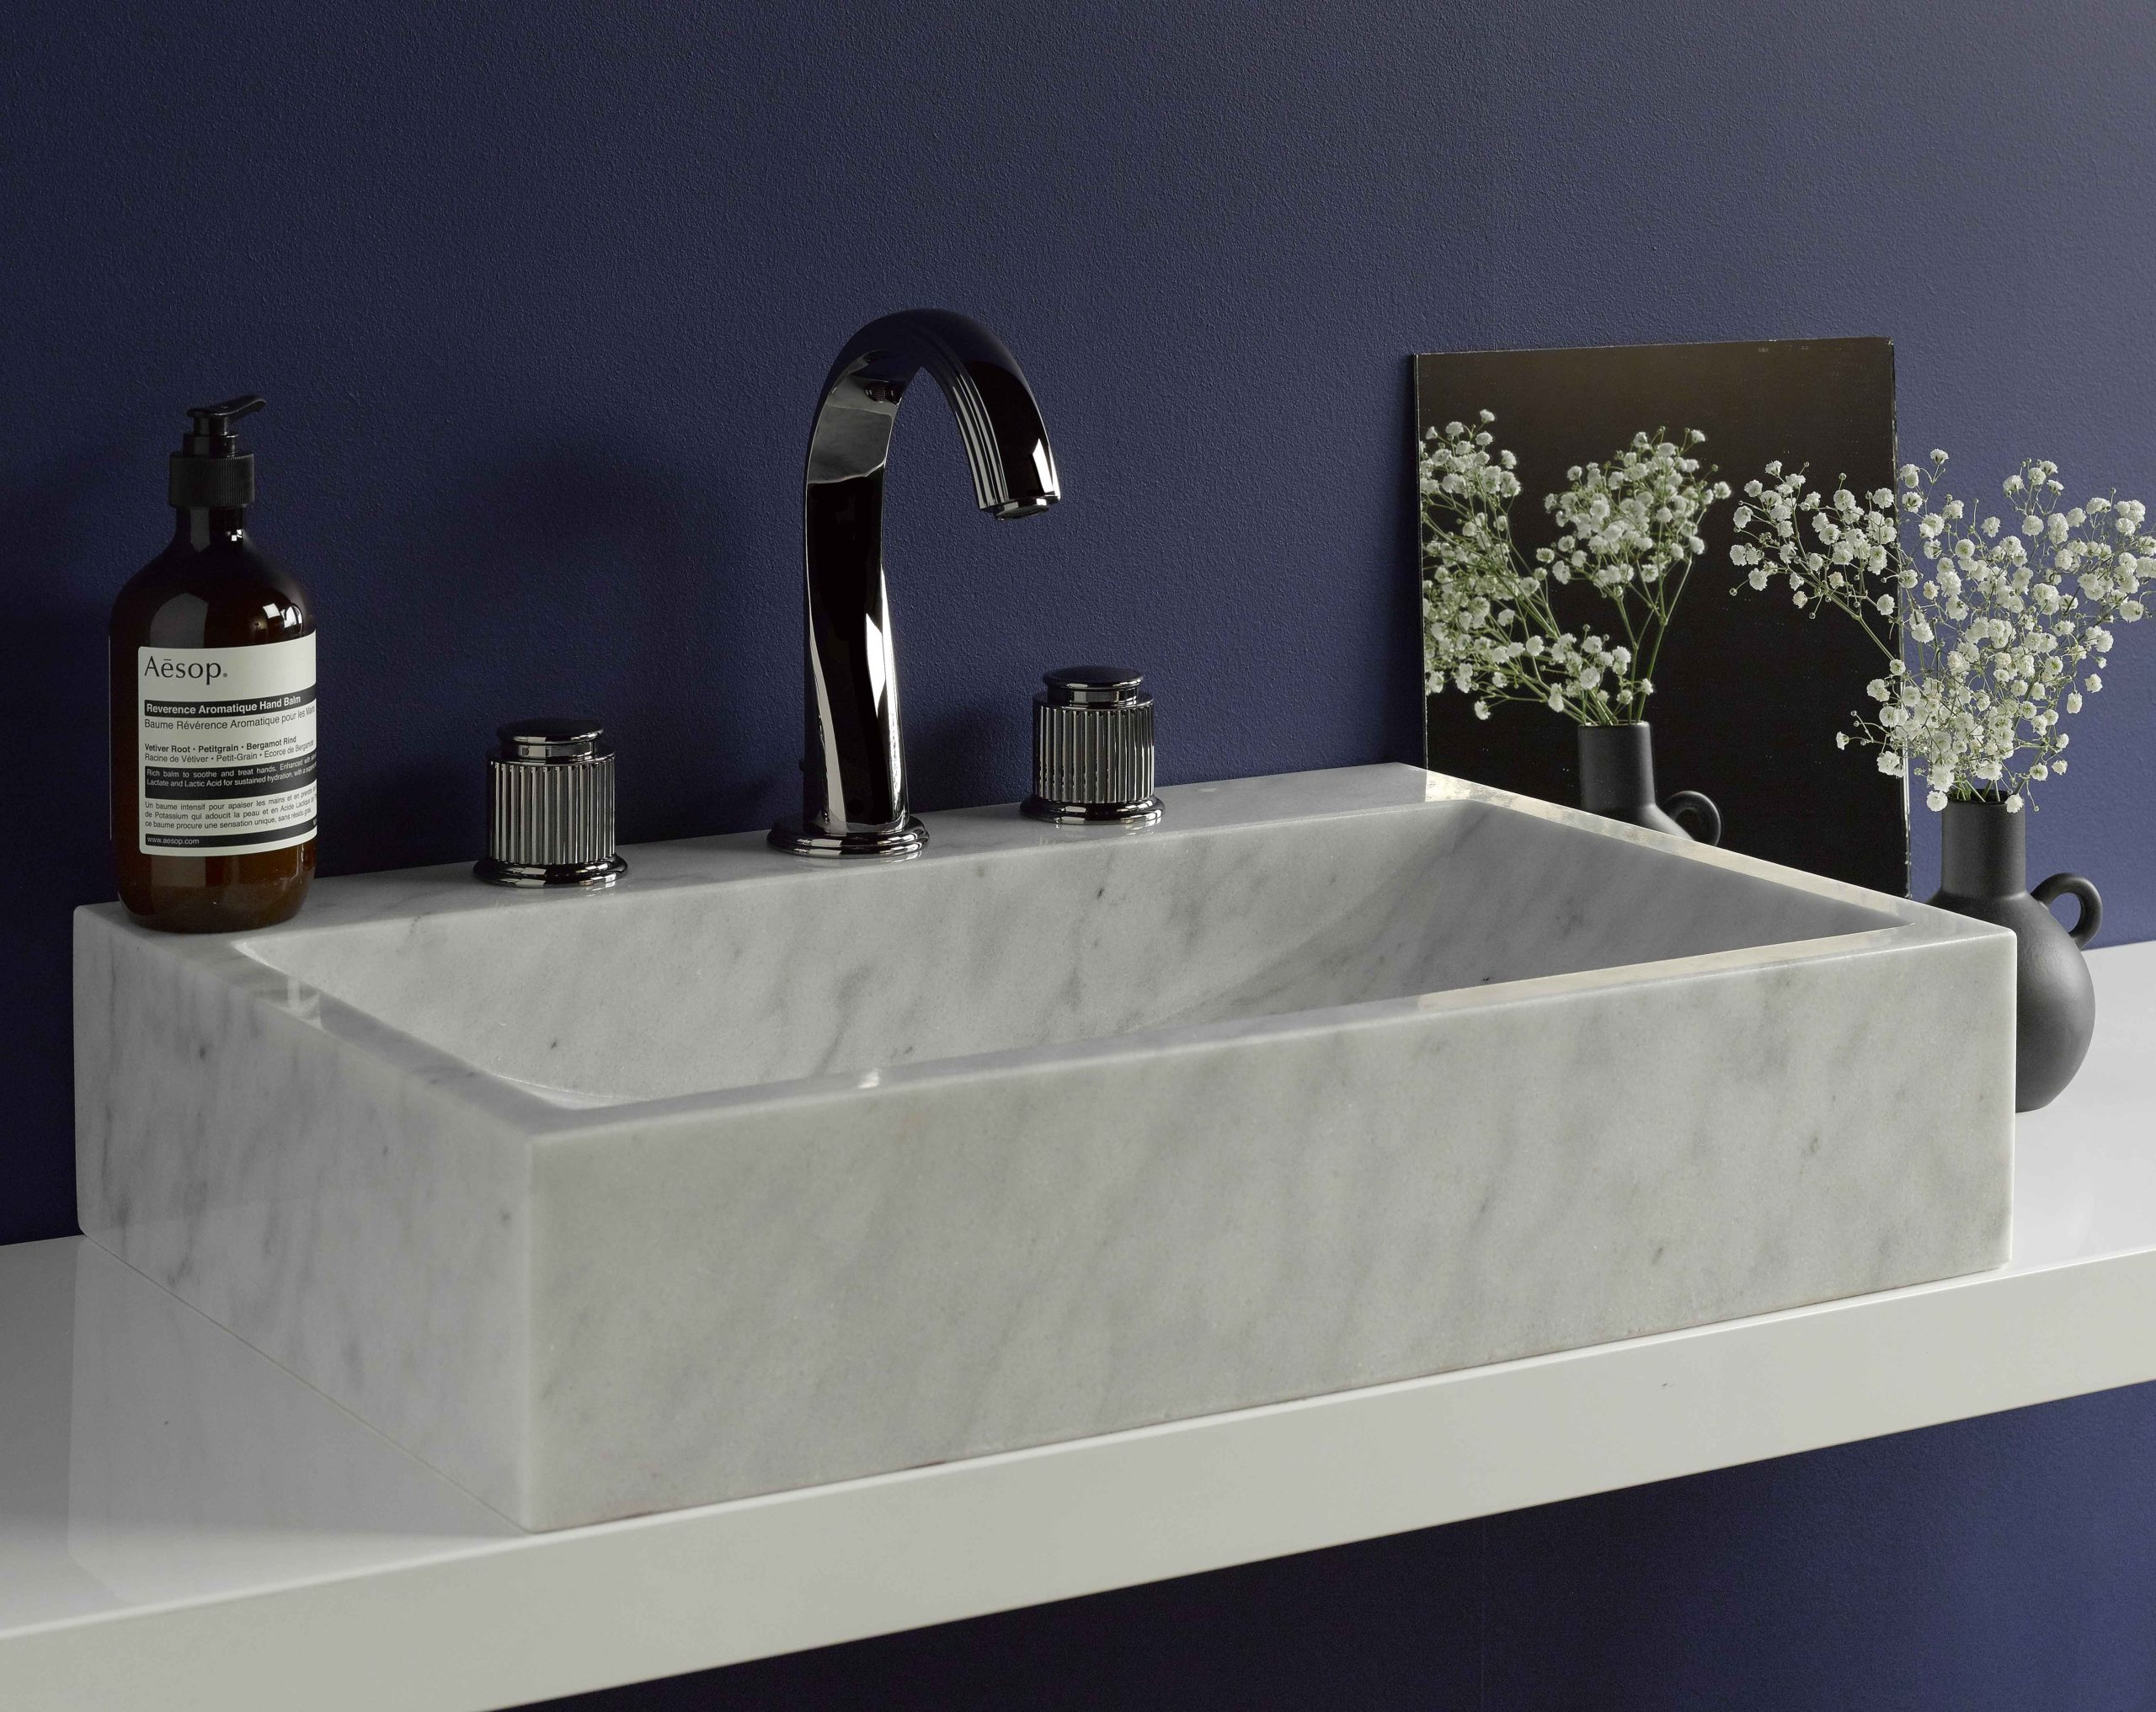 inspi-bathroom-thg-paris-16